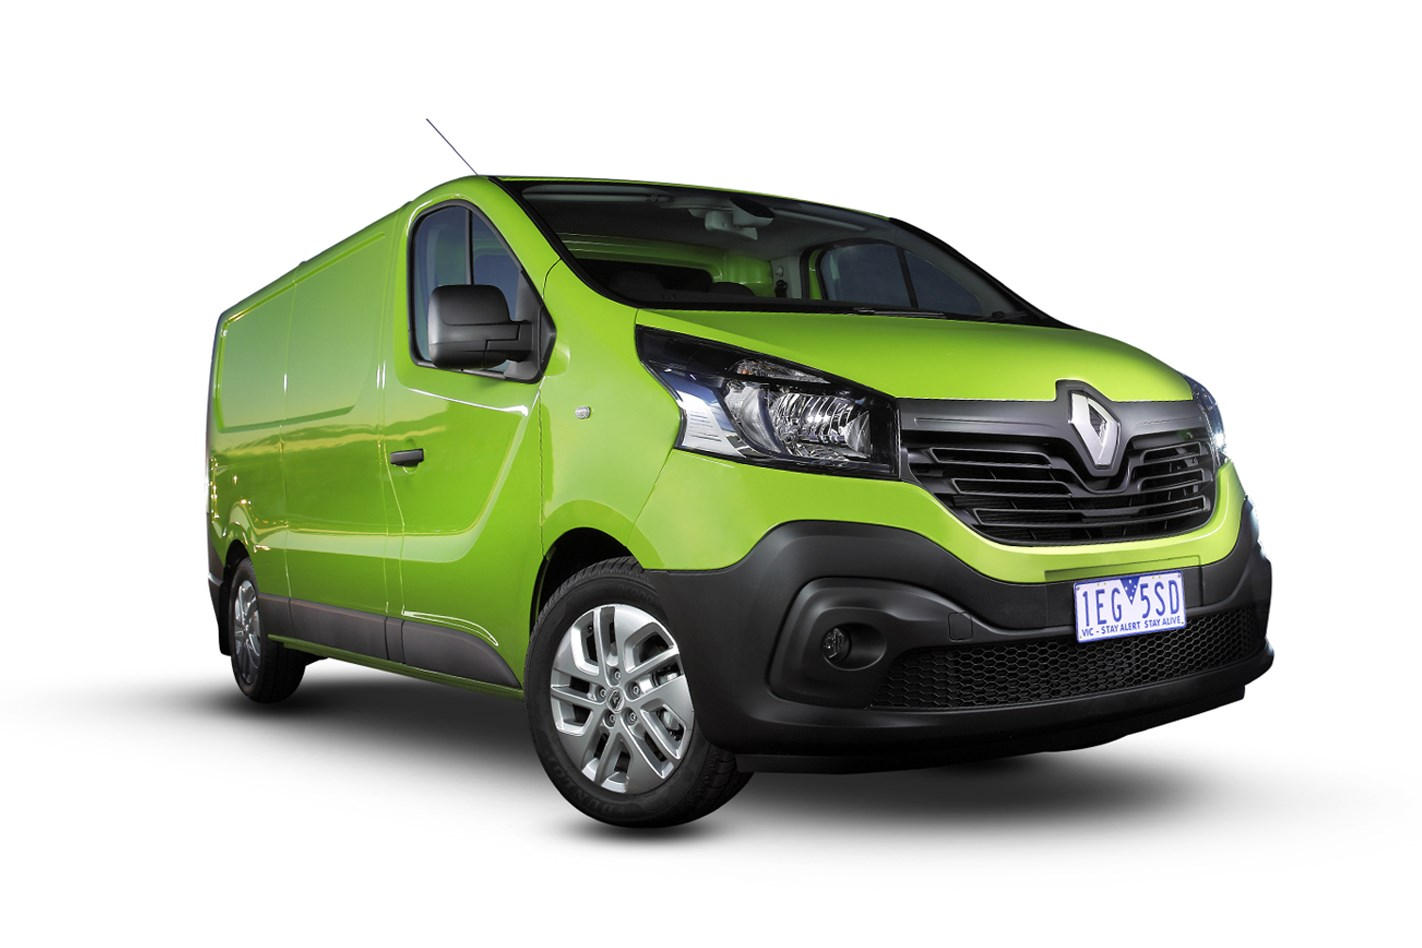 3d0d09d69f 2017 Renault Trafic LWB Lifestyle